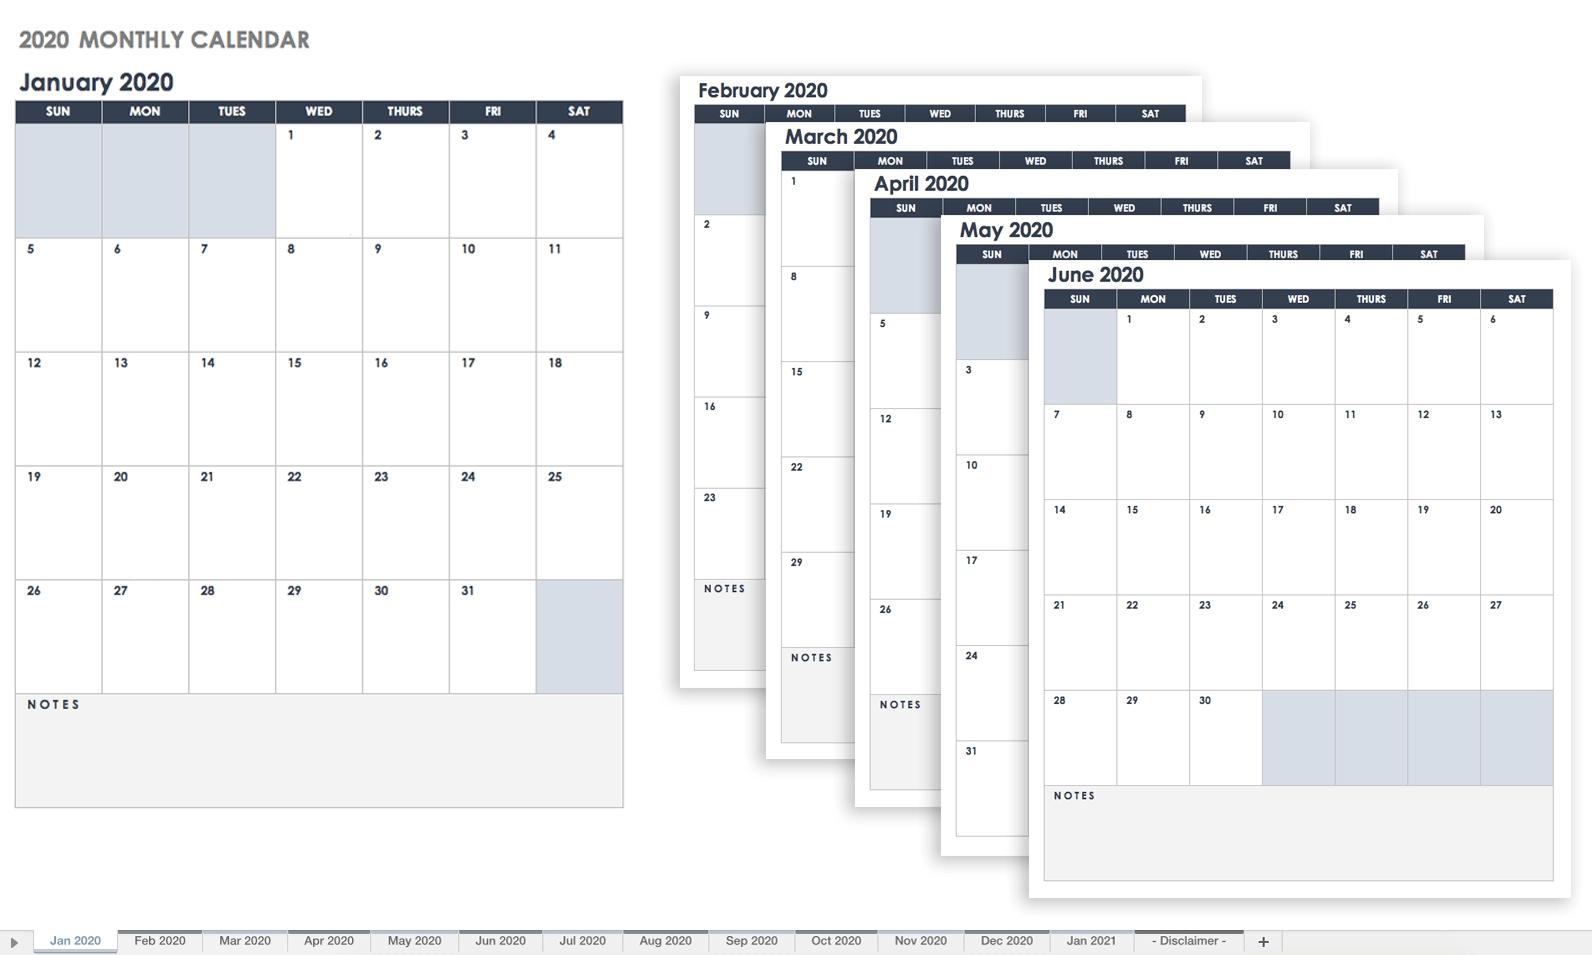 Free Google Calendar Templates | Smartsheet within Gant Chart Calendar Year In Weeks For 2020